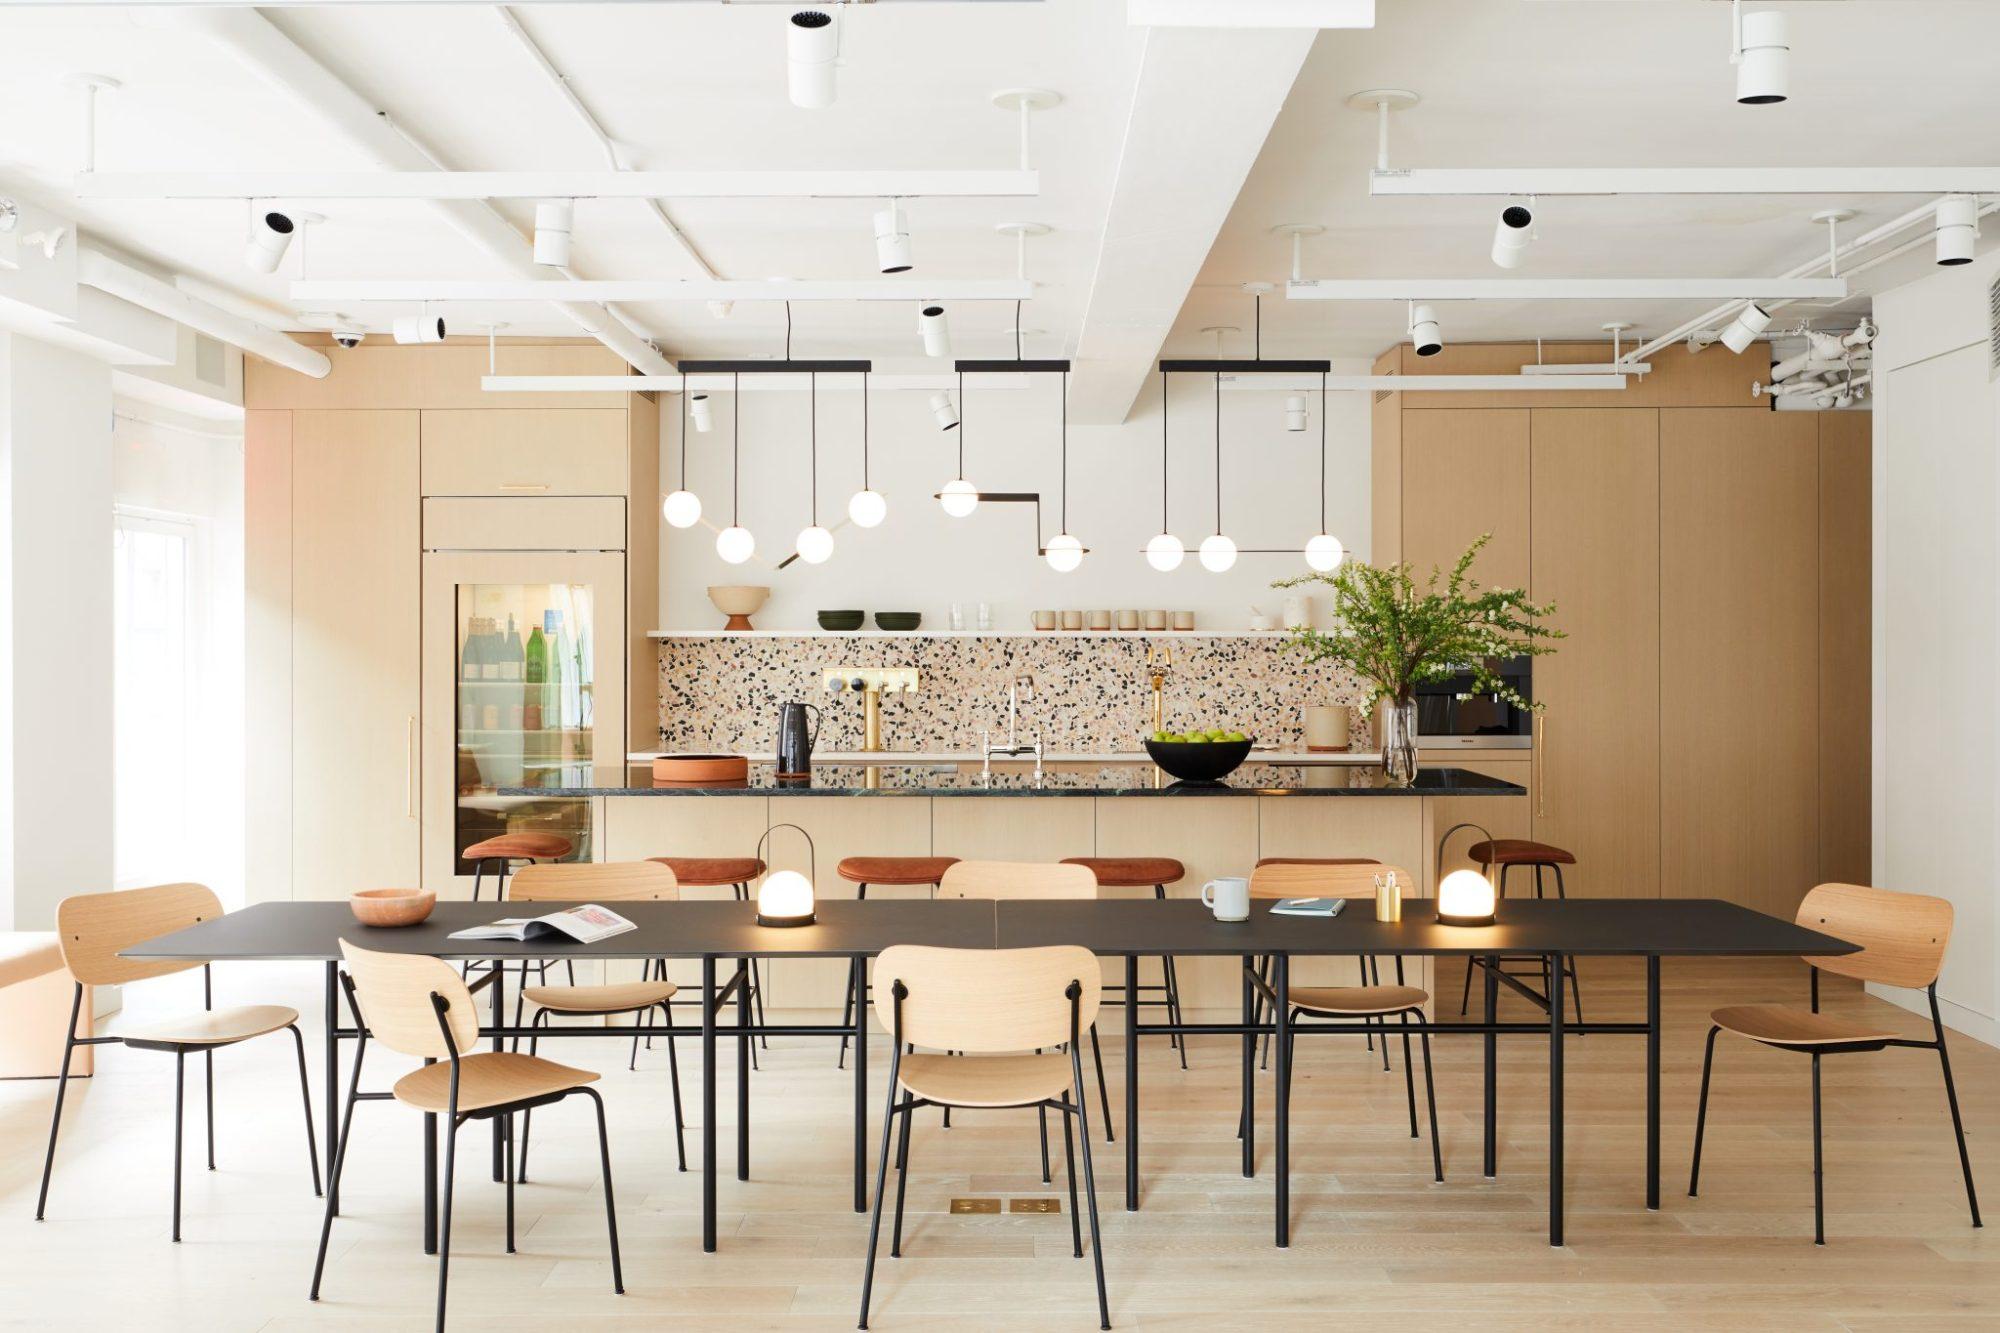 Maison Kitchen